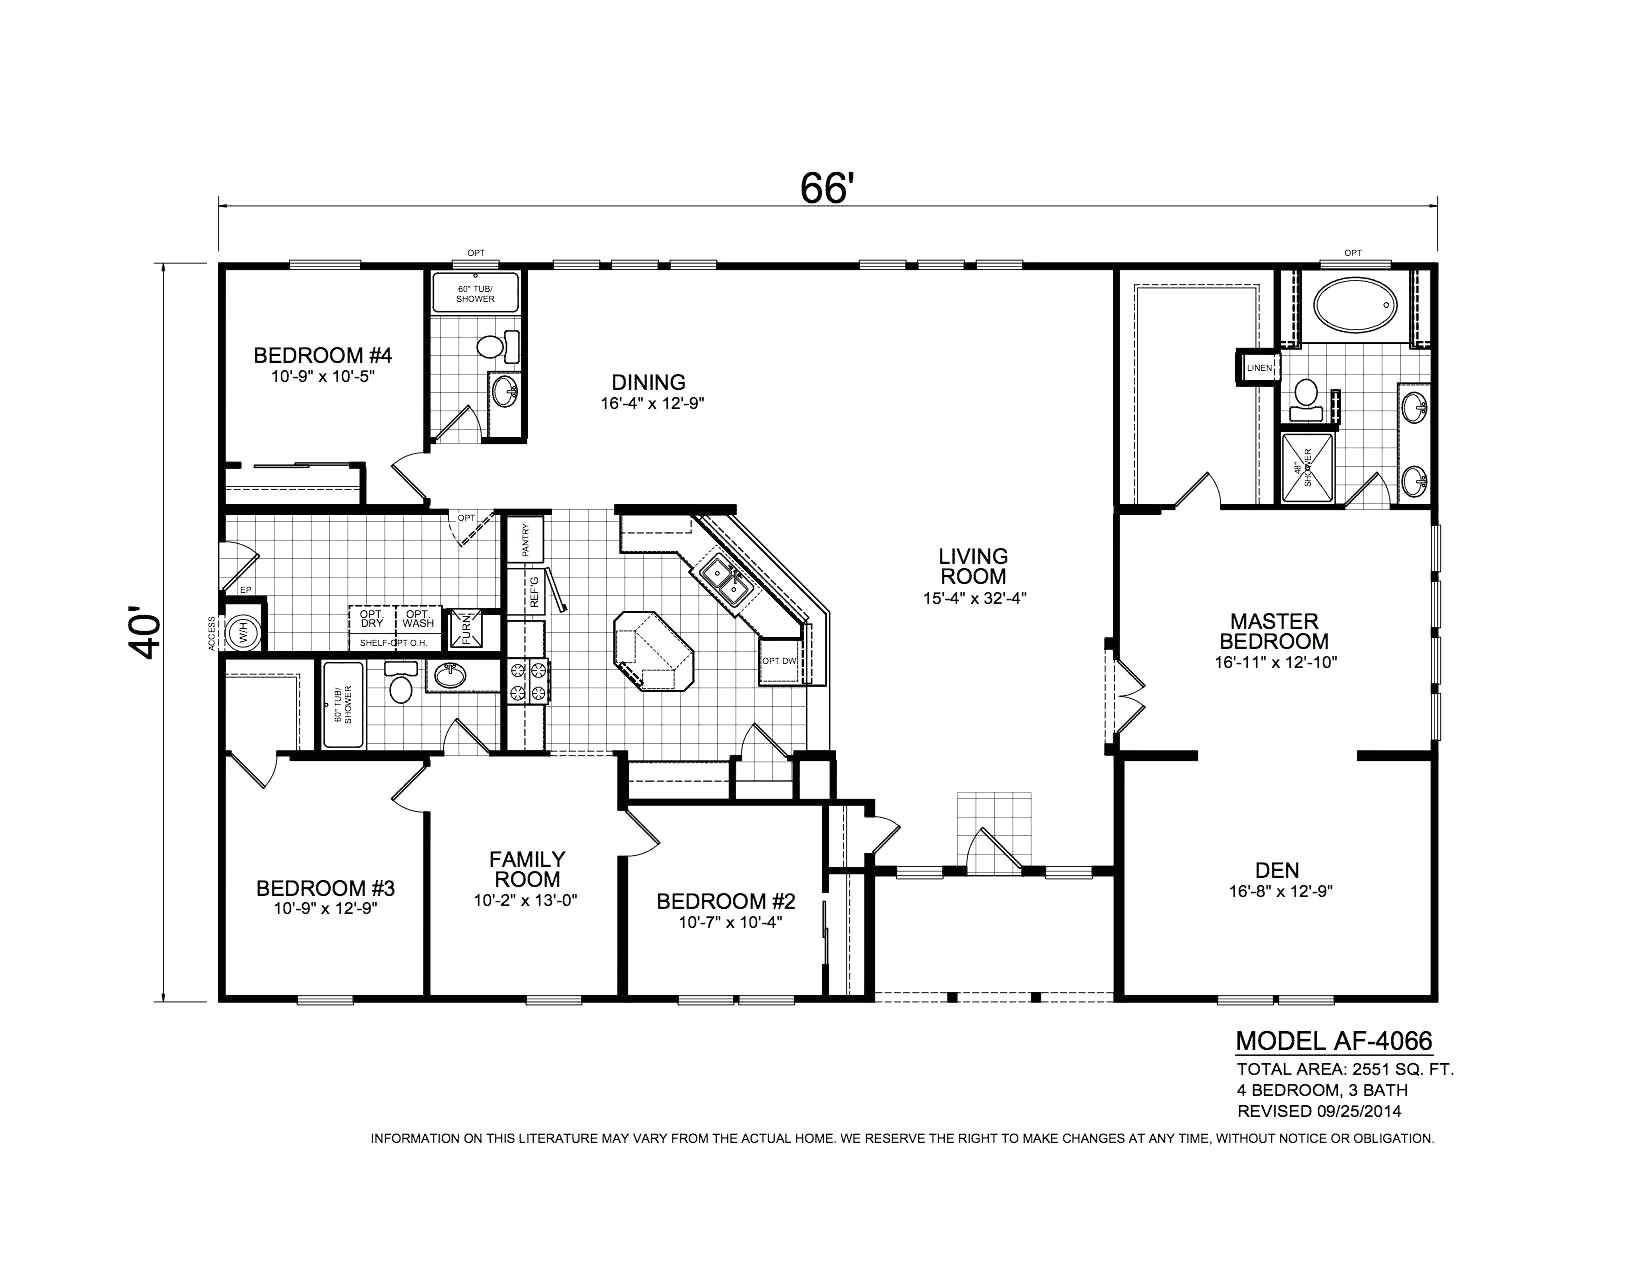 Fleetwood Mobile Homes Floor Plans 1997 | AdinaPorter